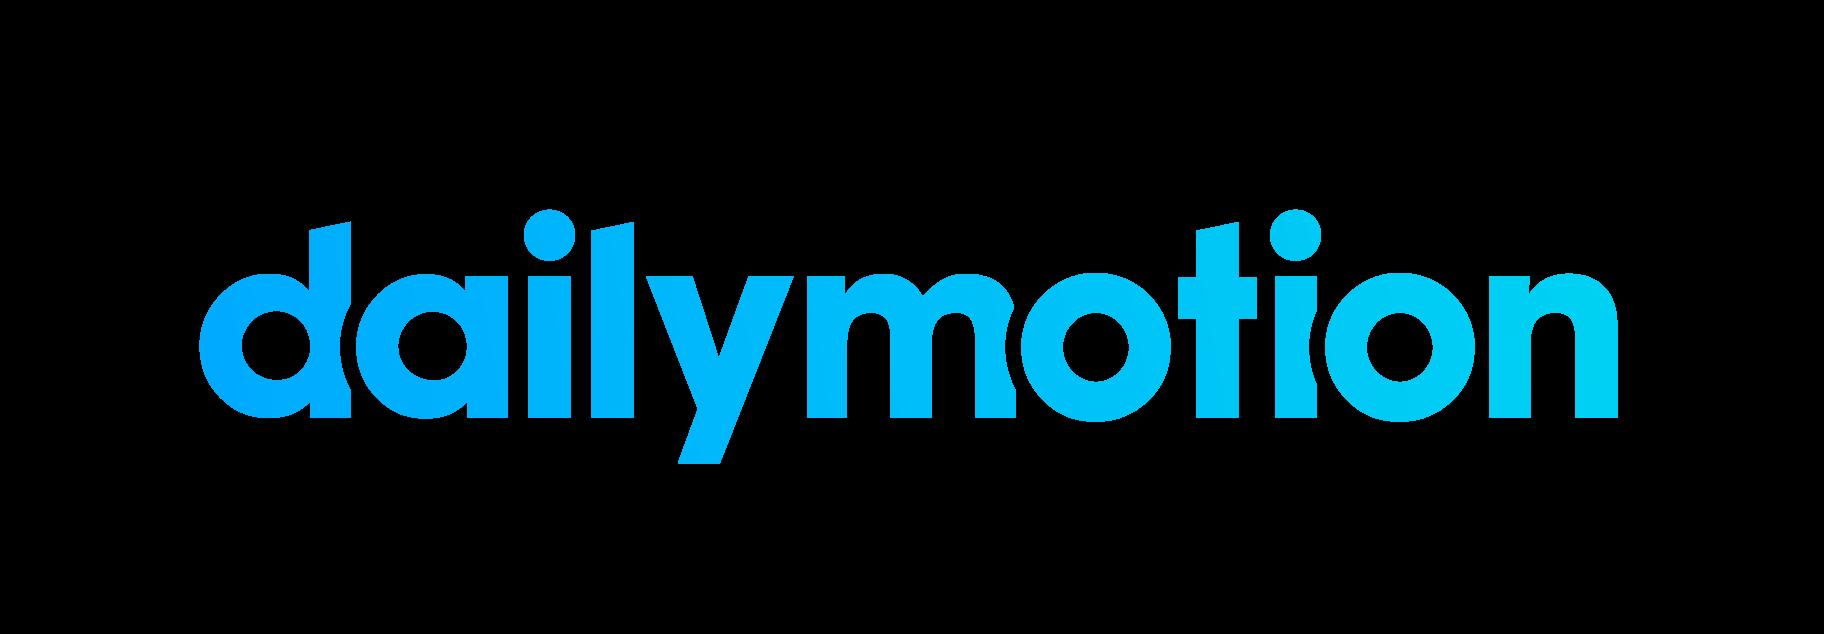 dailymotion-logo-1824x634 (1).png